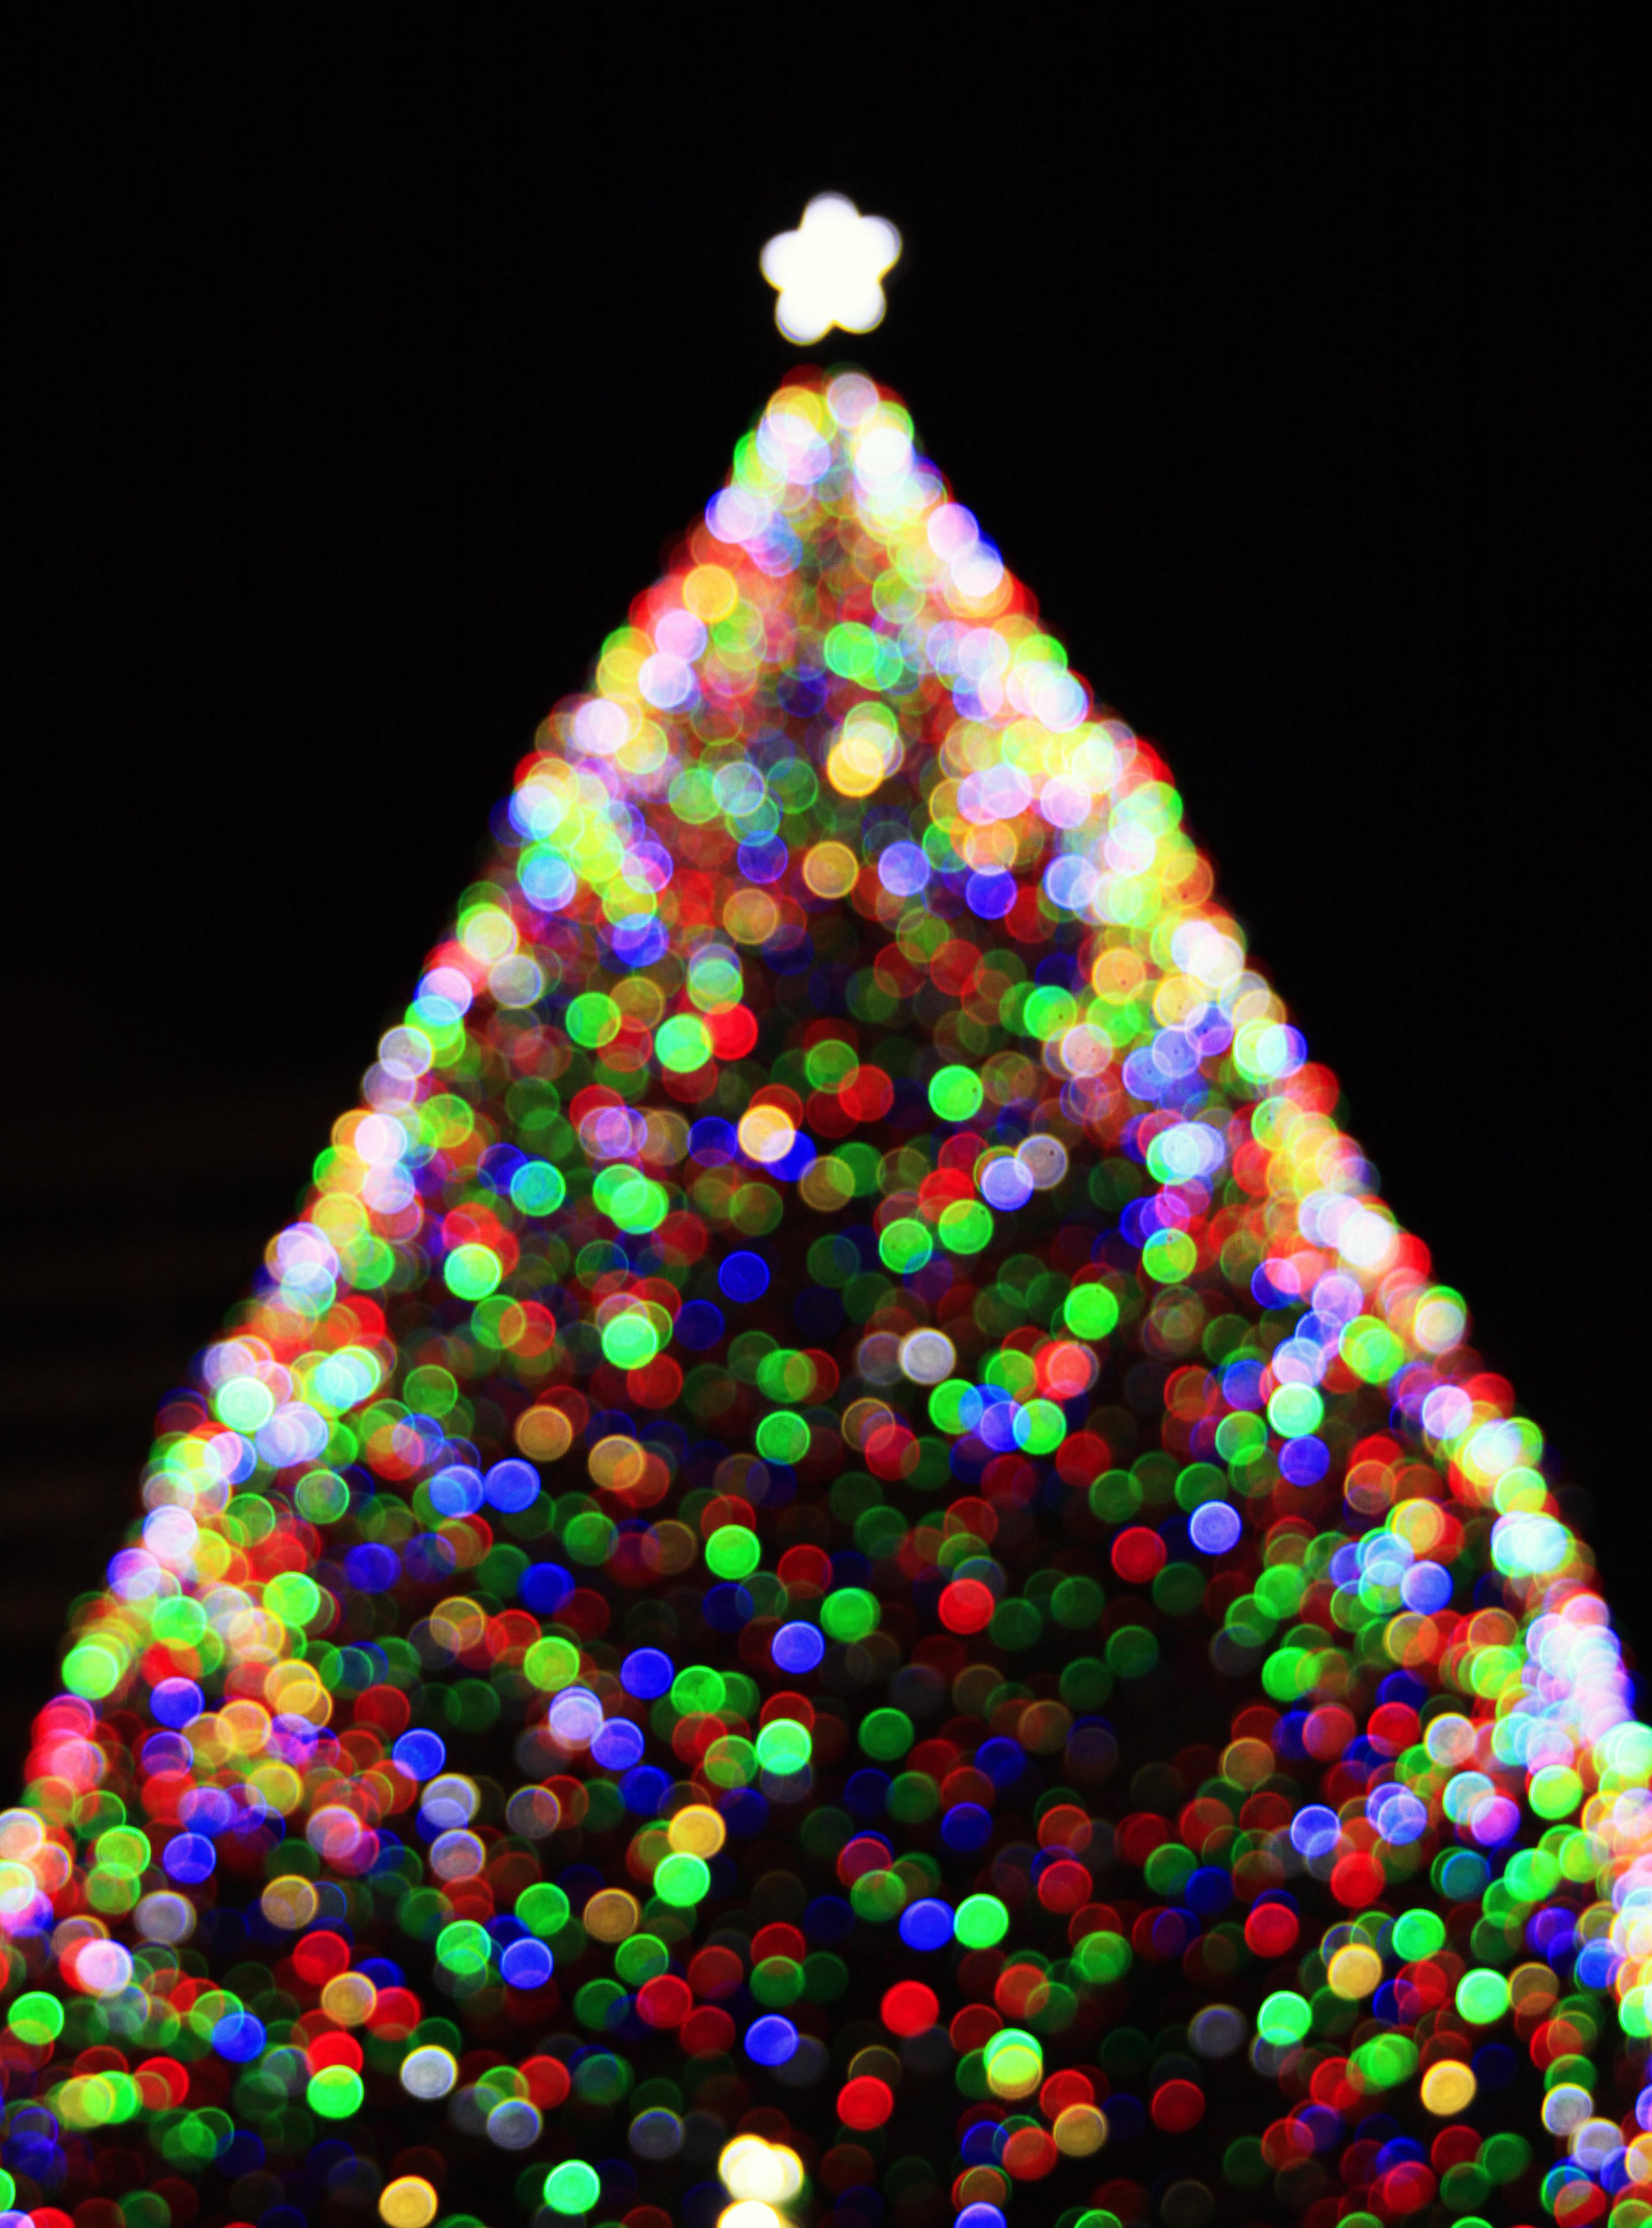 135 Christmas Tree Cataract Christmas Decoration Ideas 2018